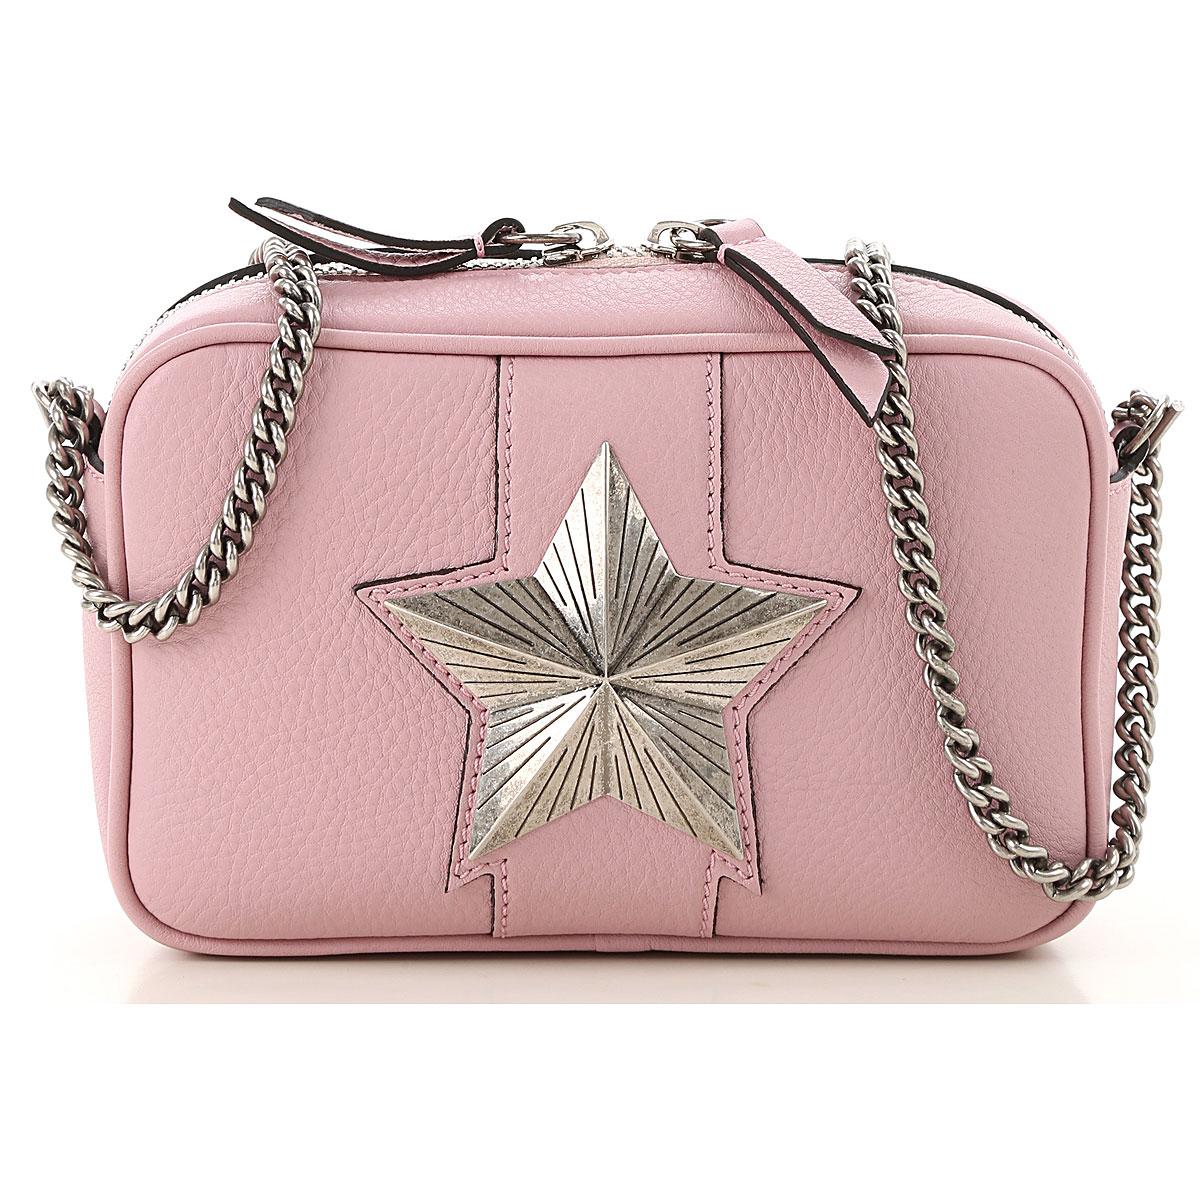 Les Jeunes Etoiles Handbags On Sale, Pink, Leather, 2019